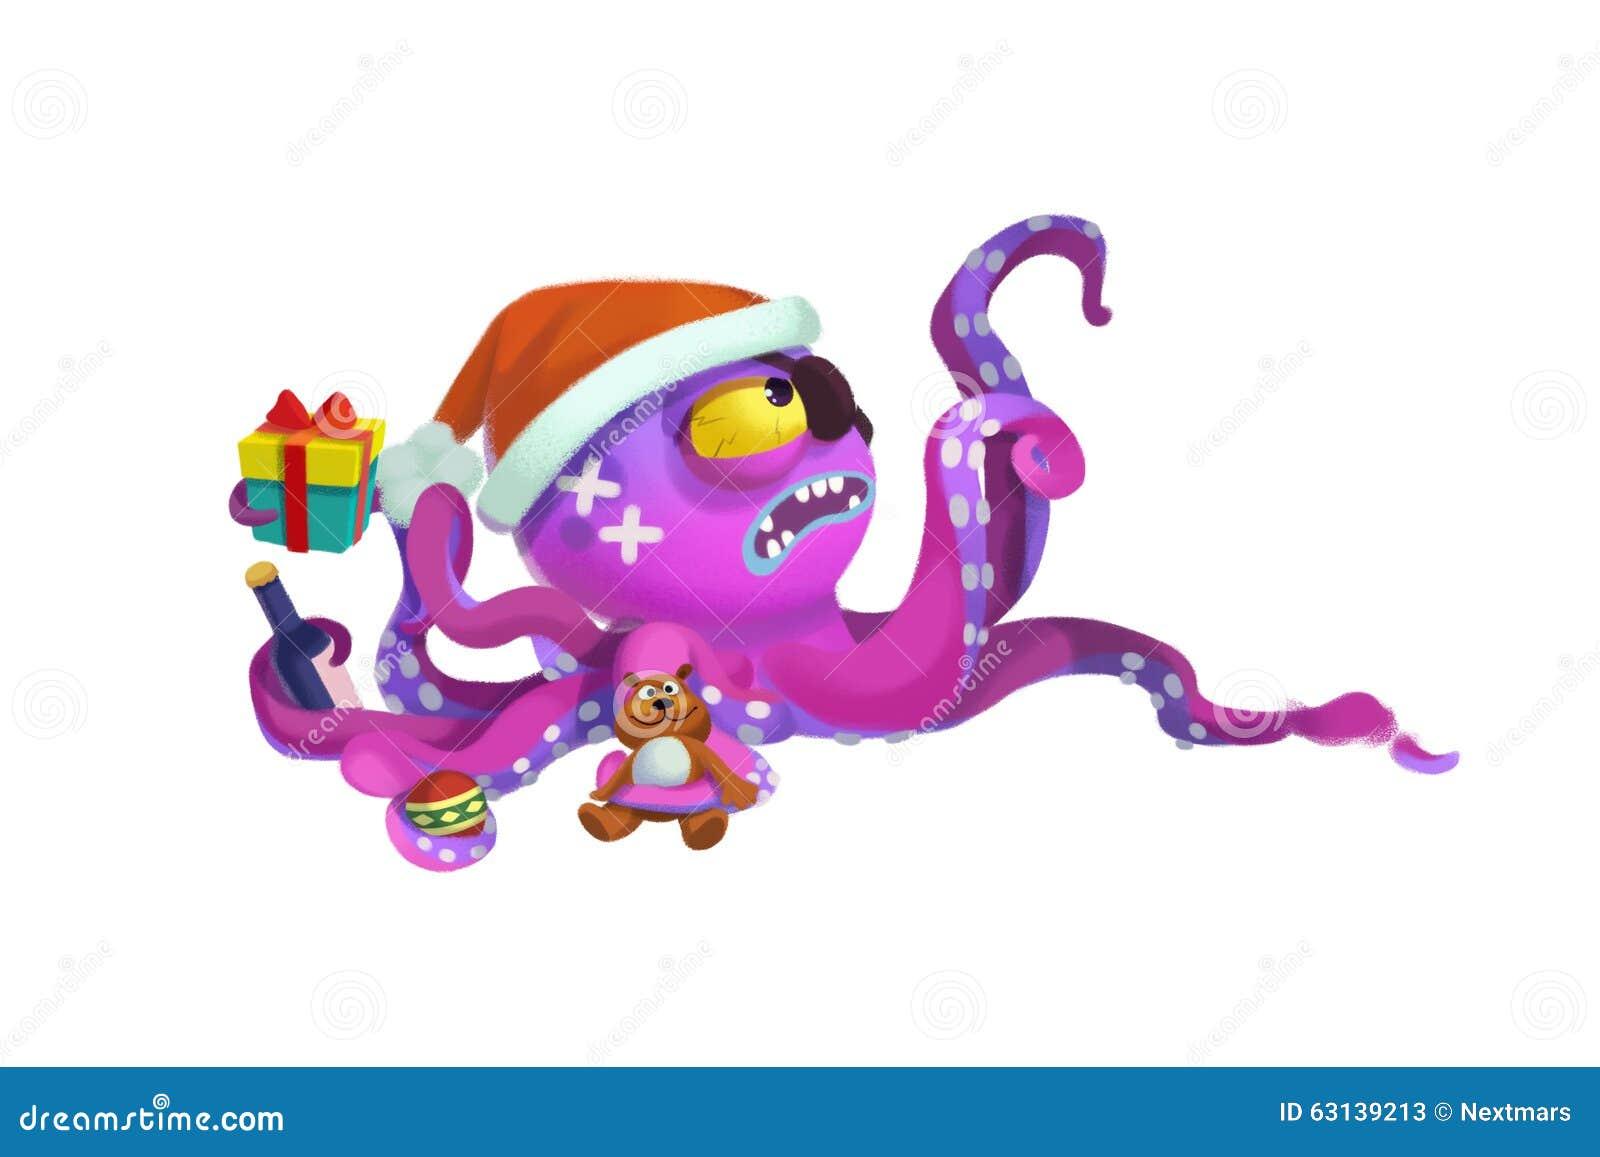 Octopus Christmas